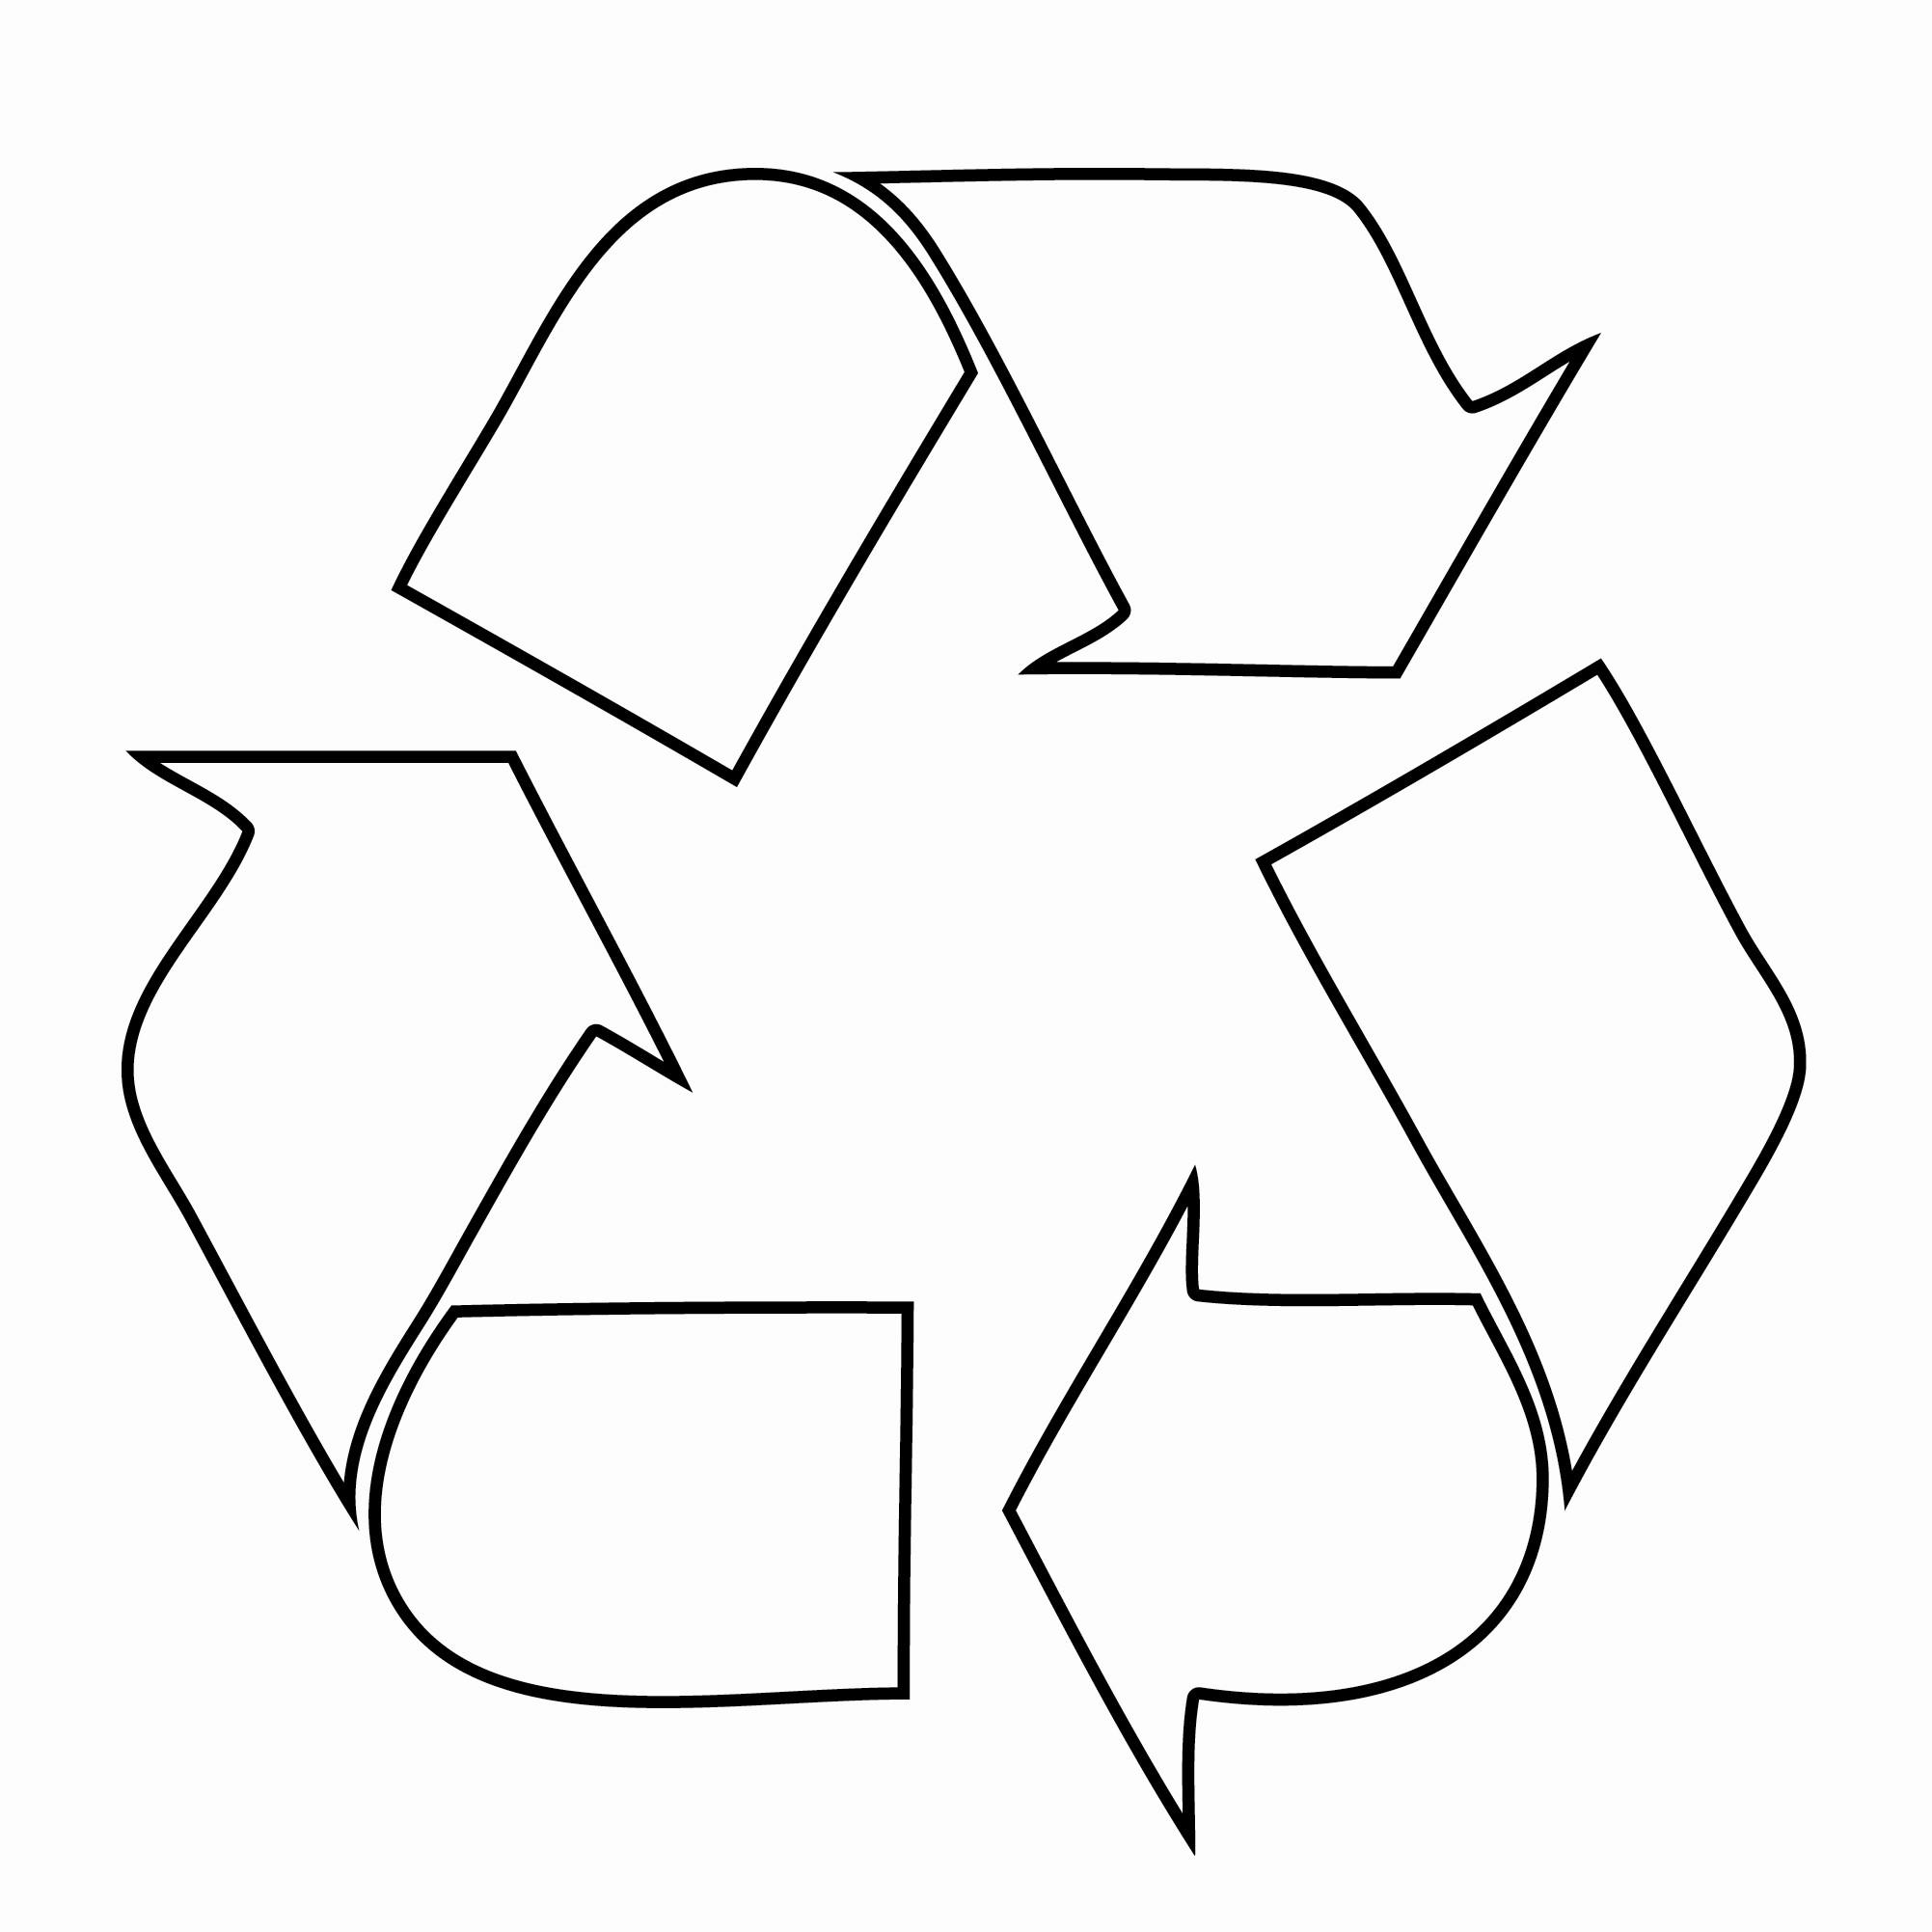 Recycling Symbols - ClipArt Best - ClipArt Best